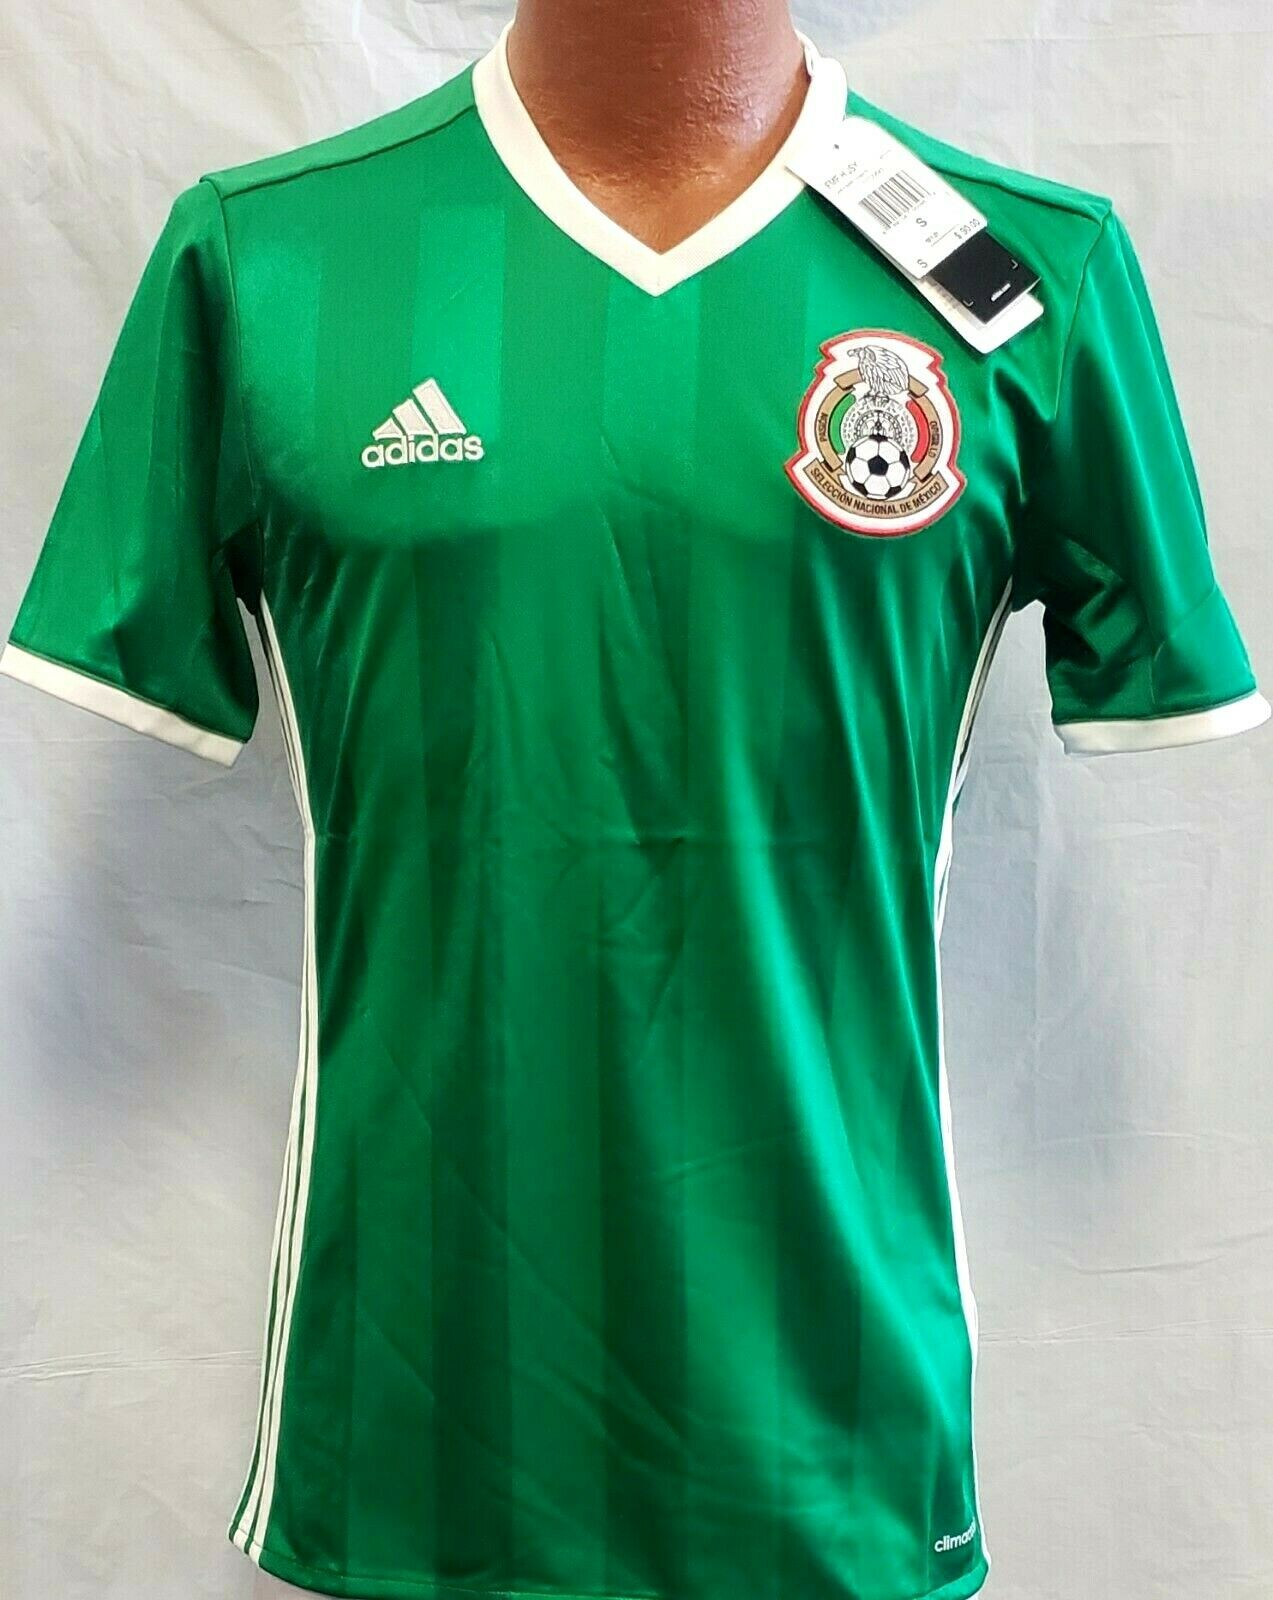 NeW Adidas Green Mexico National Team